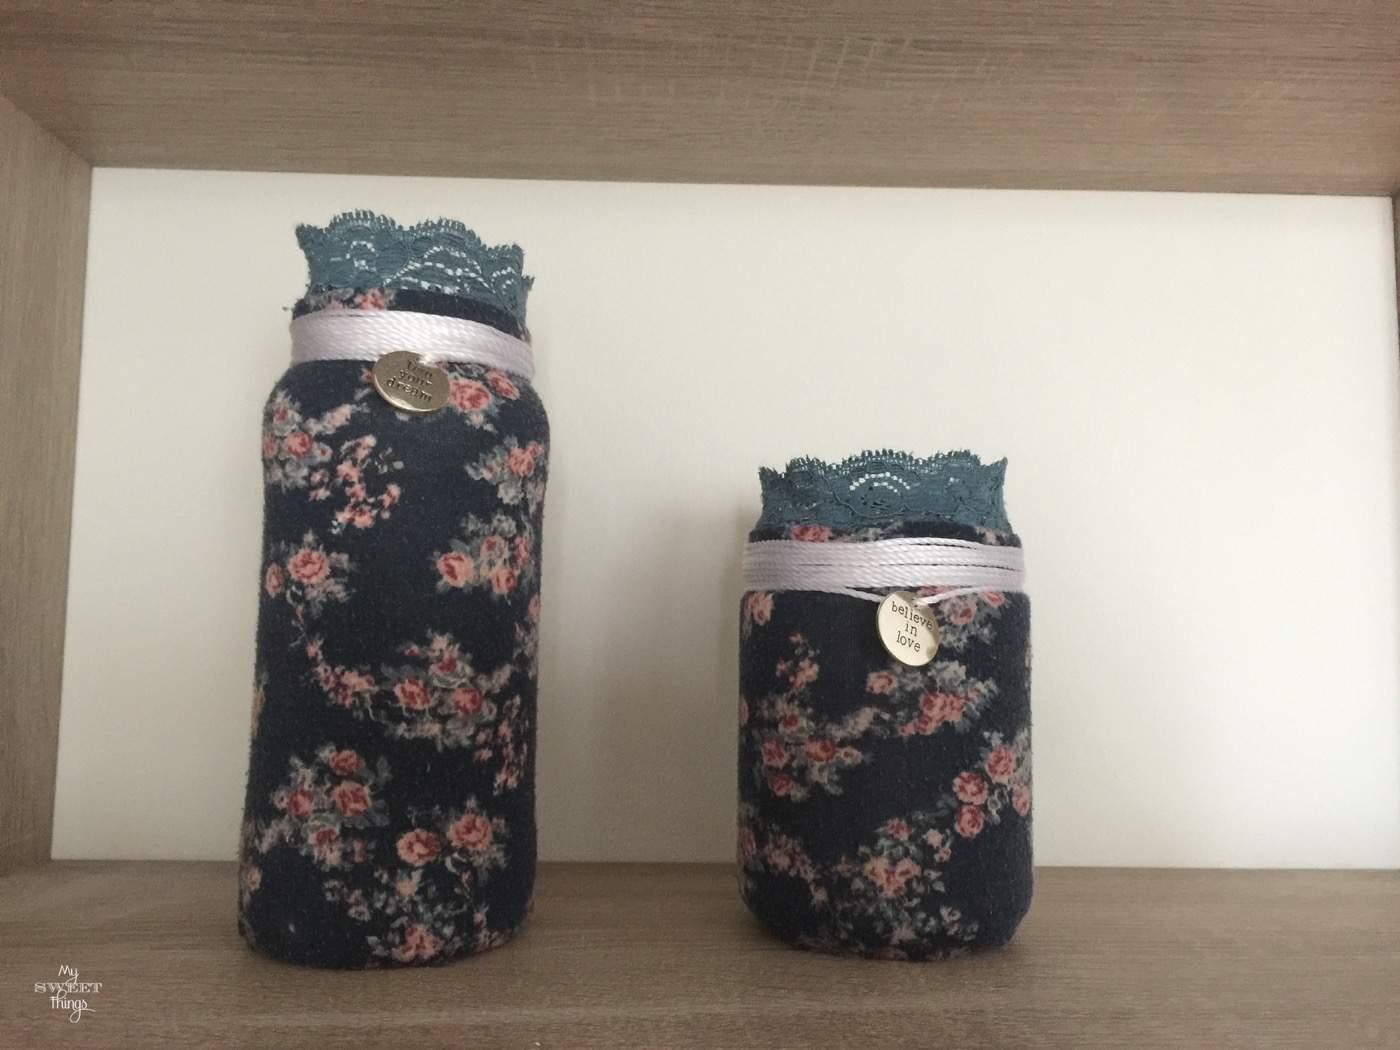 Glass jars used as home decor  ·  Via www.sweethings.net